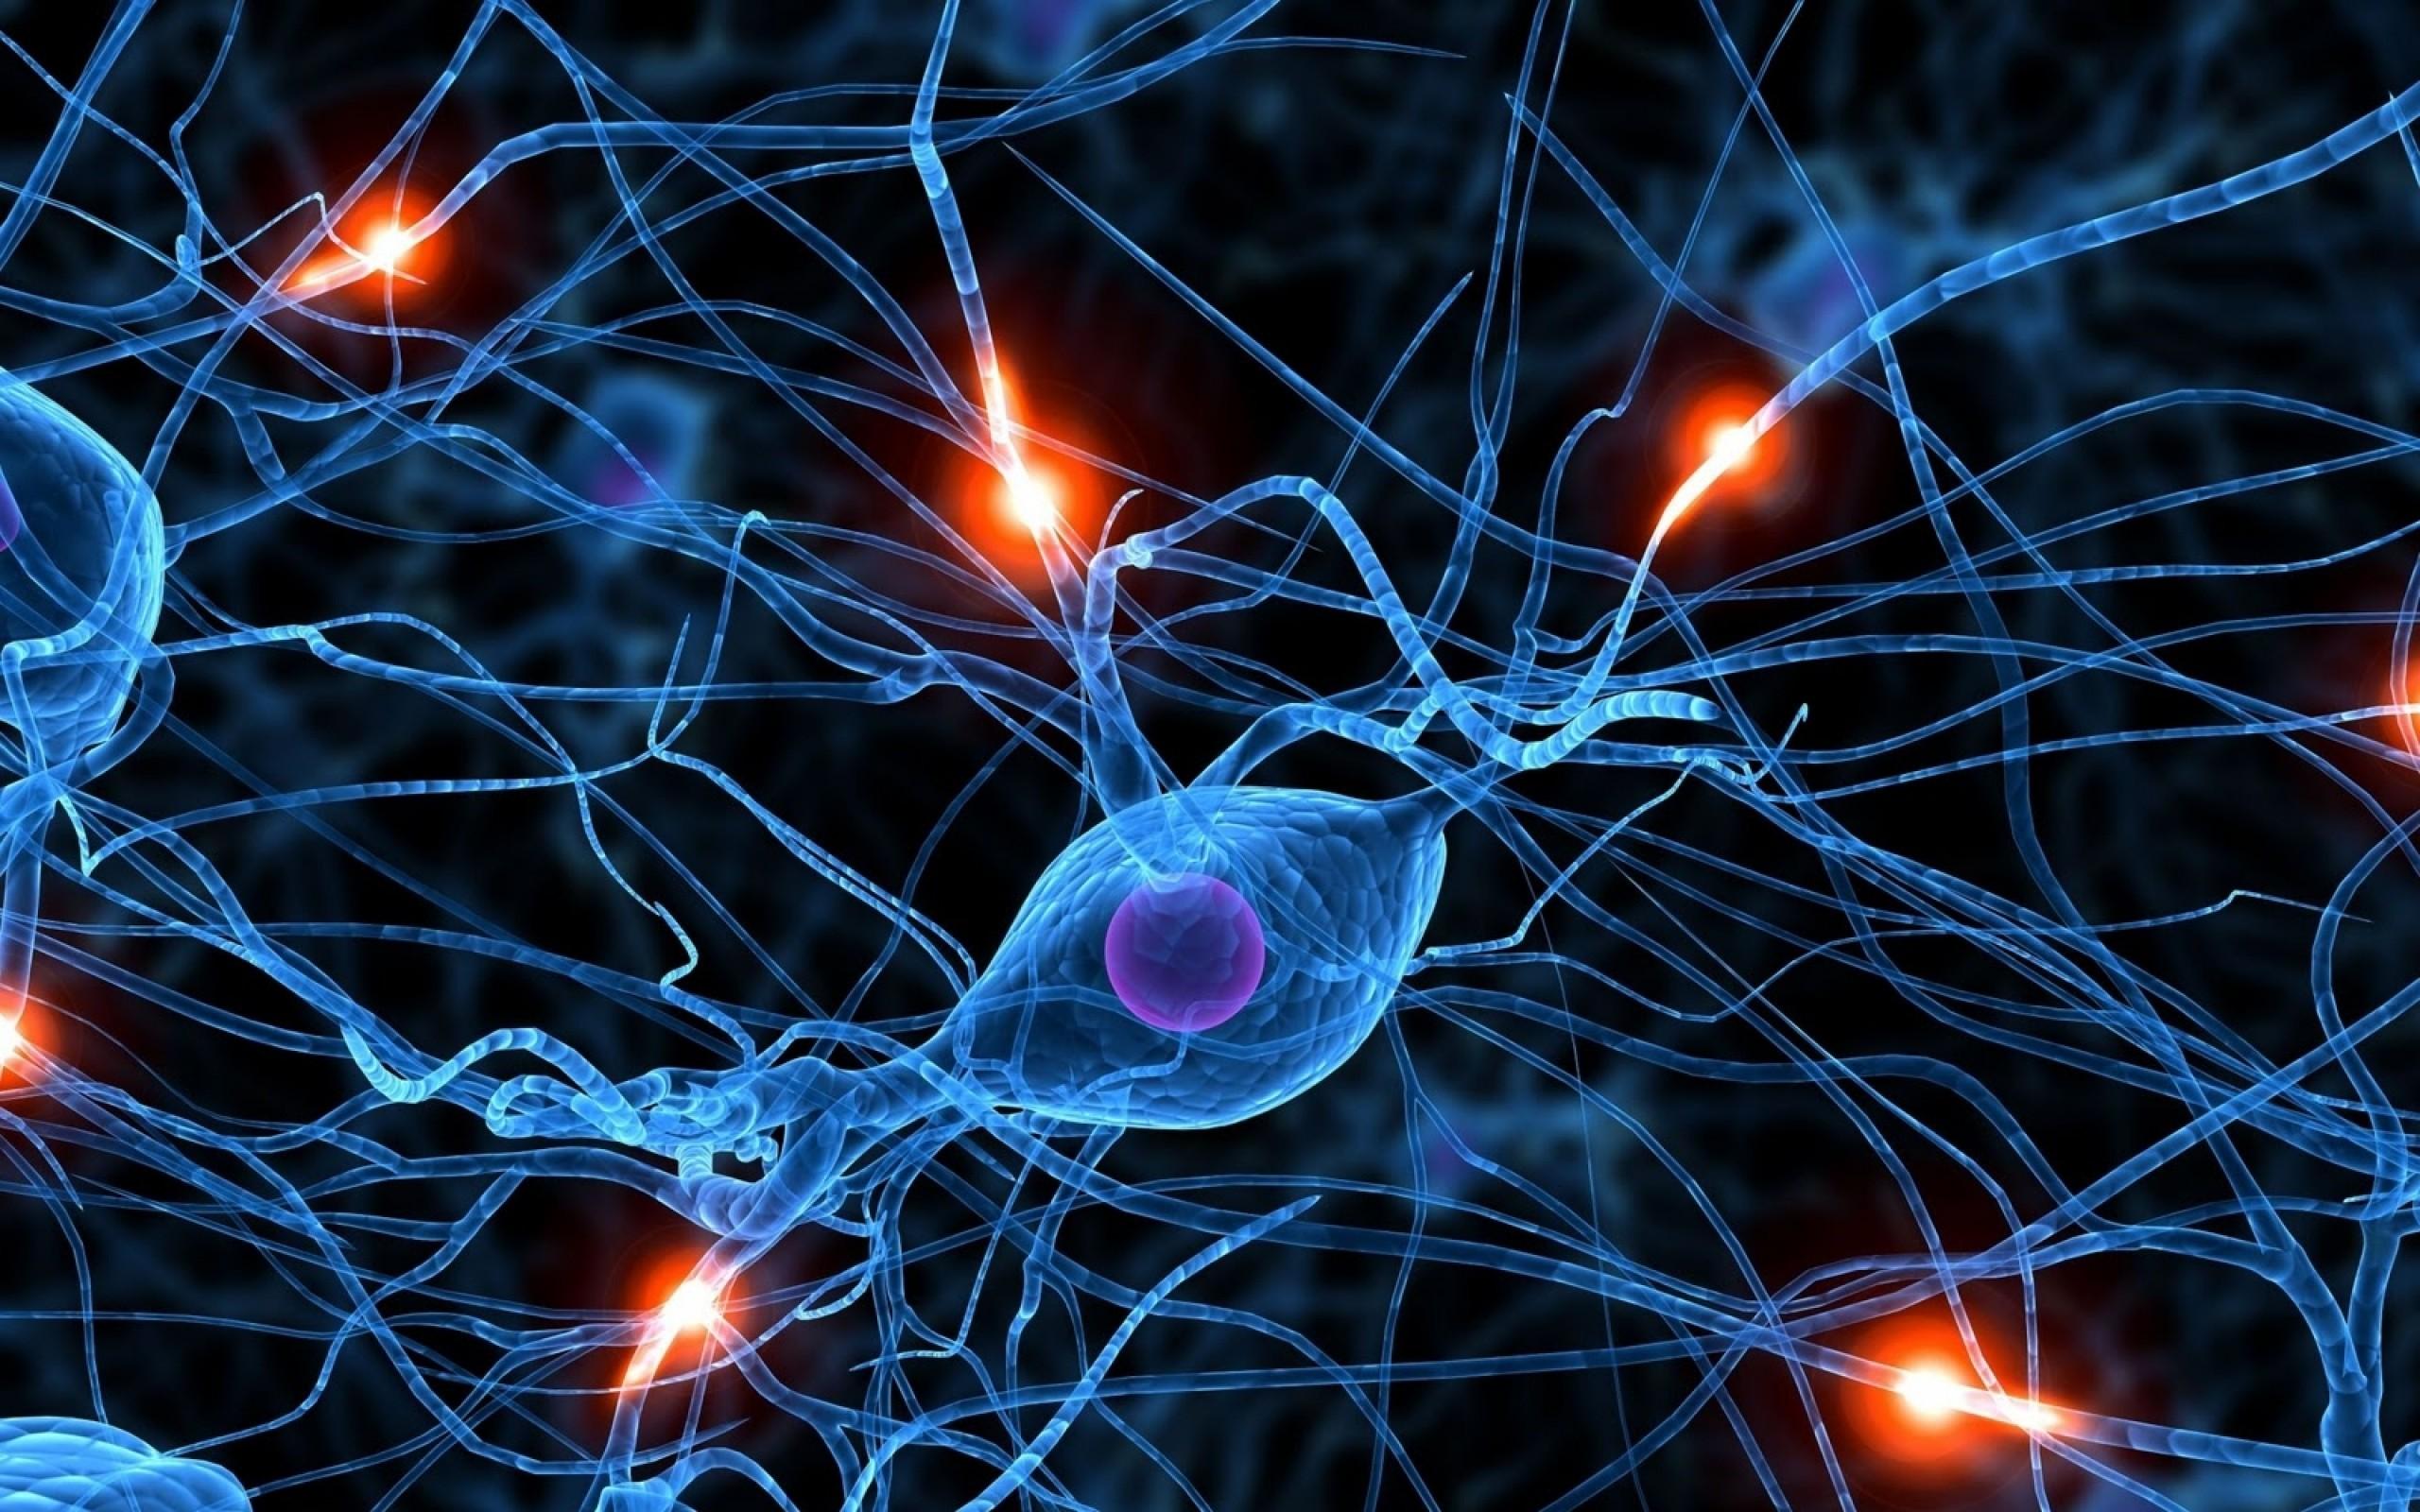 brain synapse neurons 1600×1200 wallpaper Art HD Wallpaper